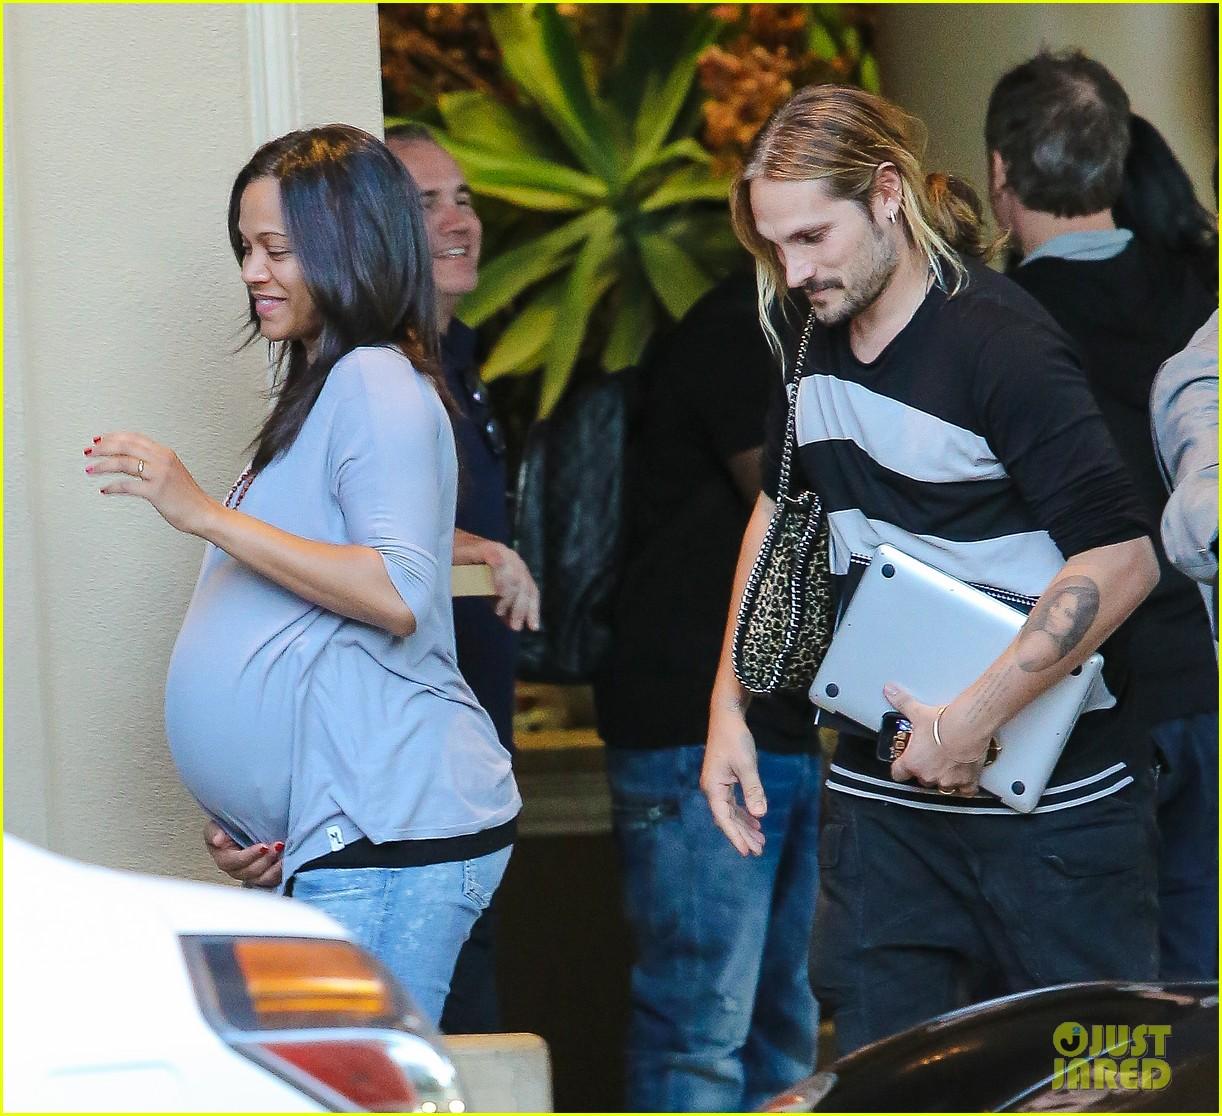 Pregnant Zoe Saldana Keeps Her Baby Bump Looking Chic Photo